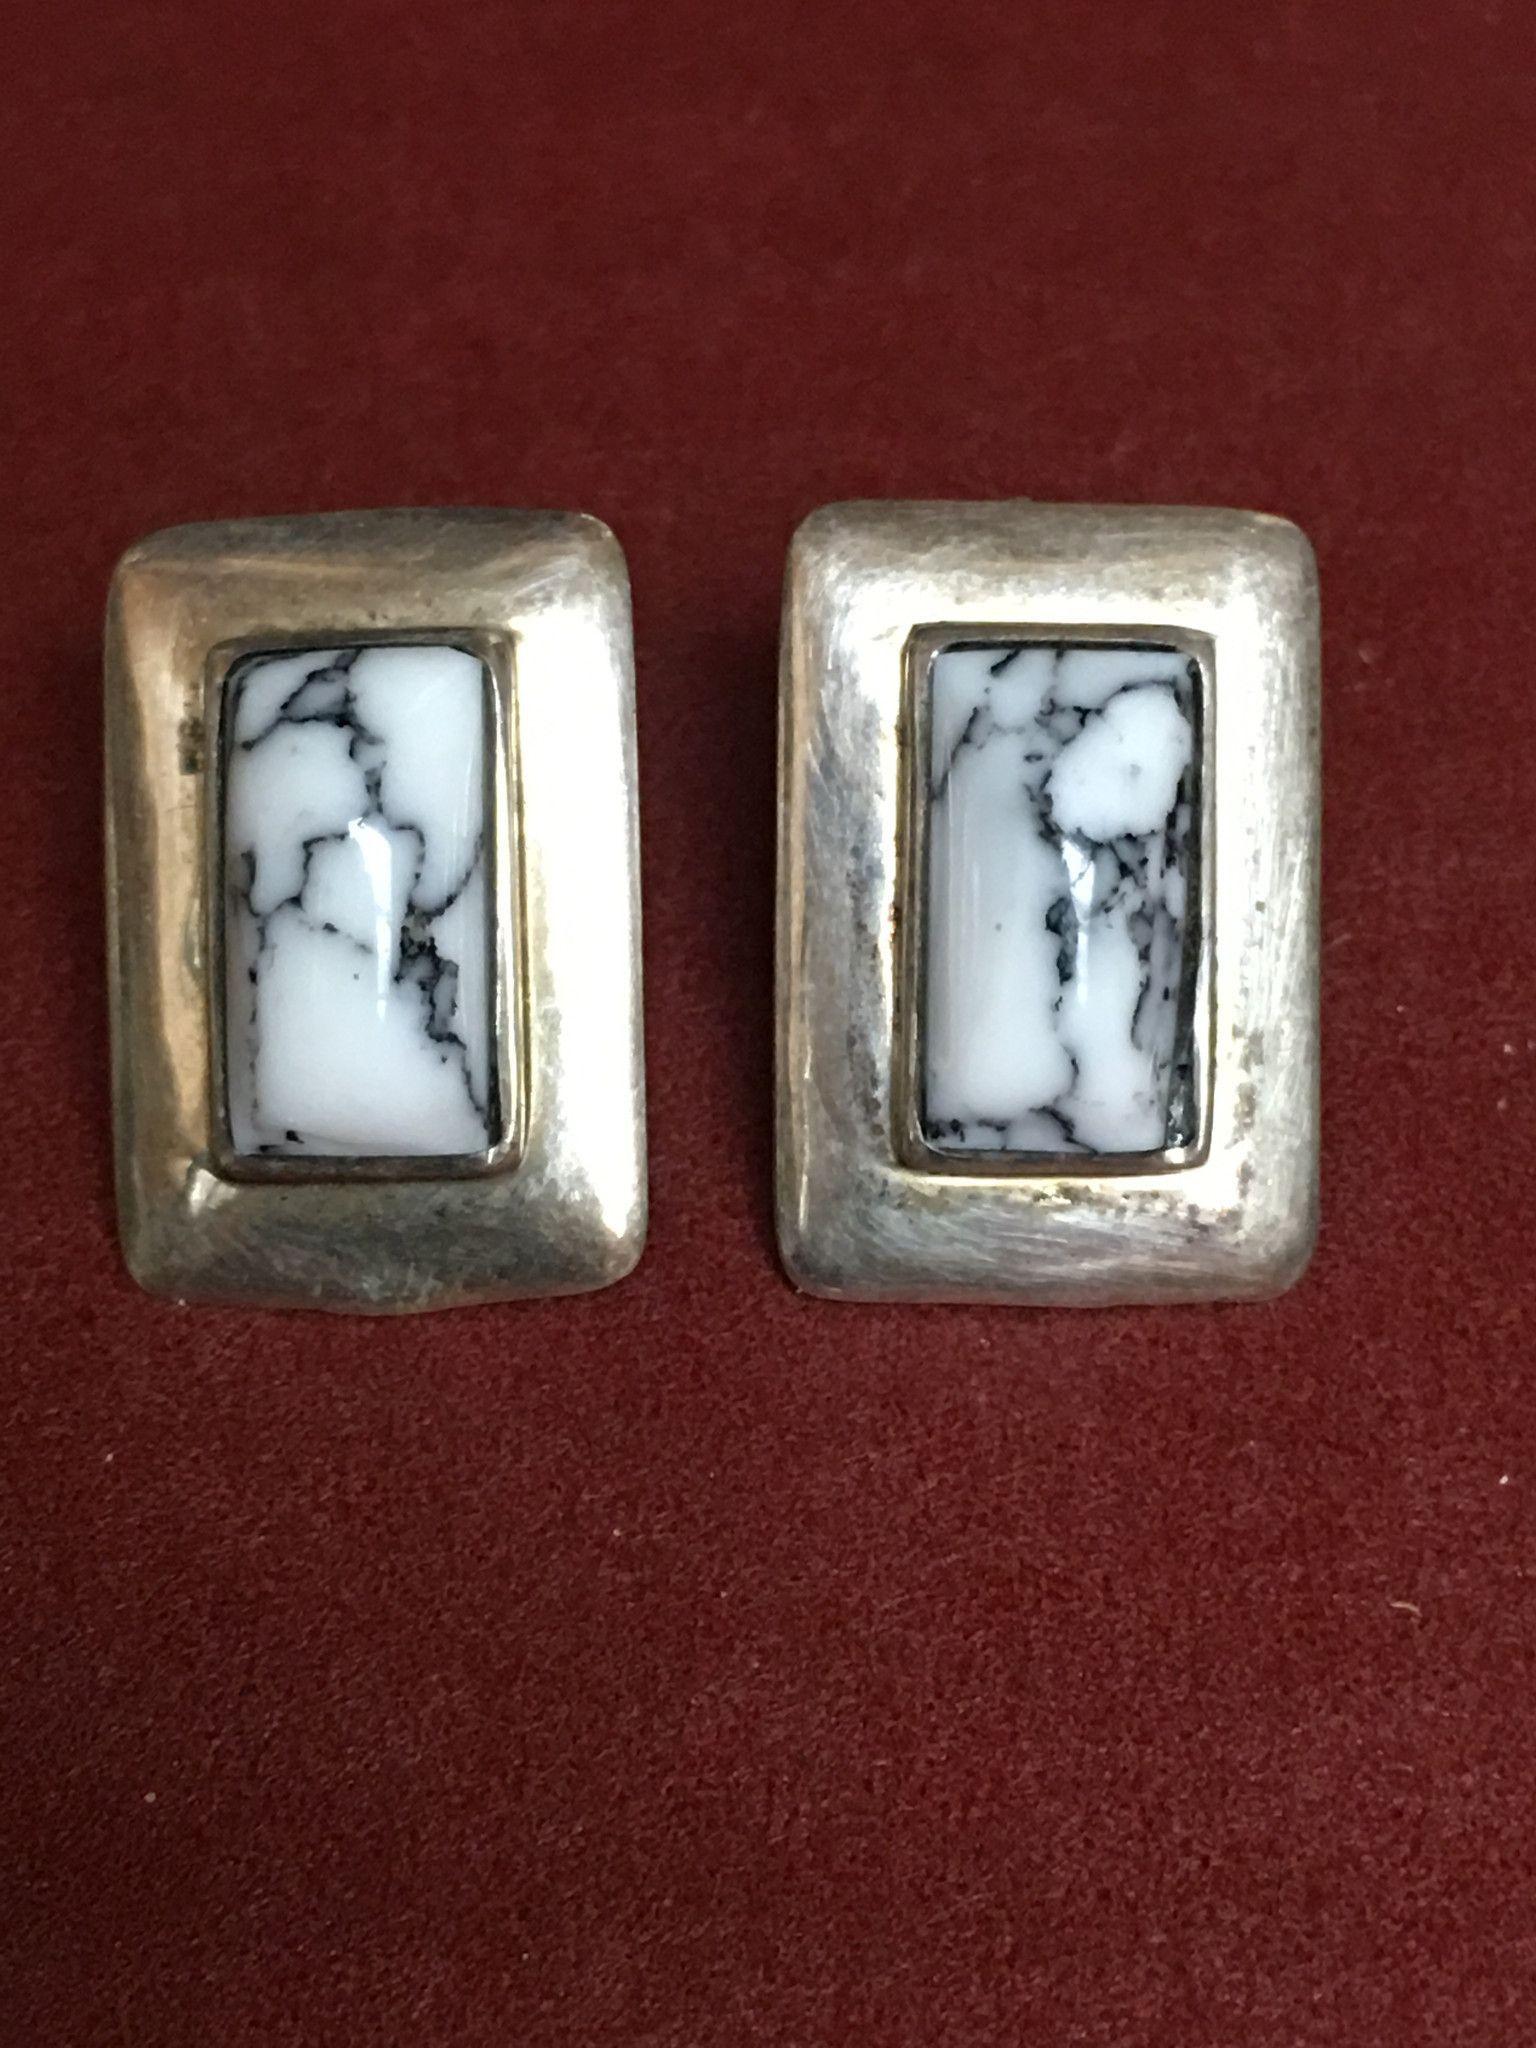 White Turquoise Earrings White Buffalo Pierced Navajo Post Studs Southwest Southwestern White Turquoise White Buffalo Turquoise